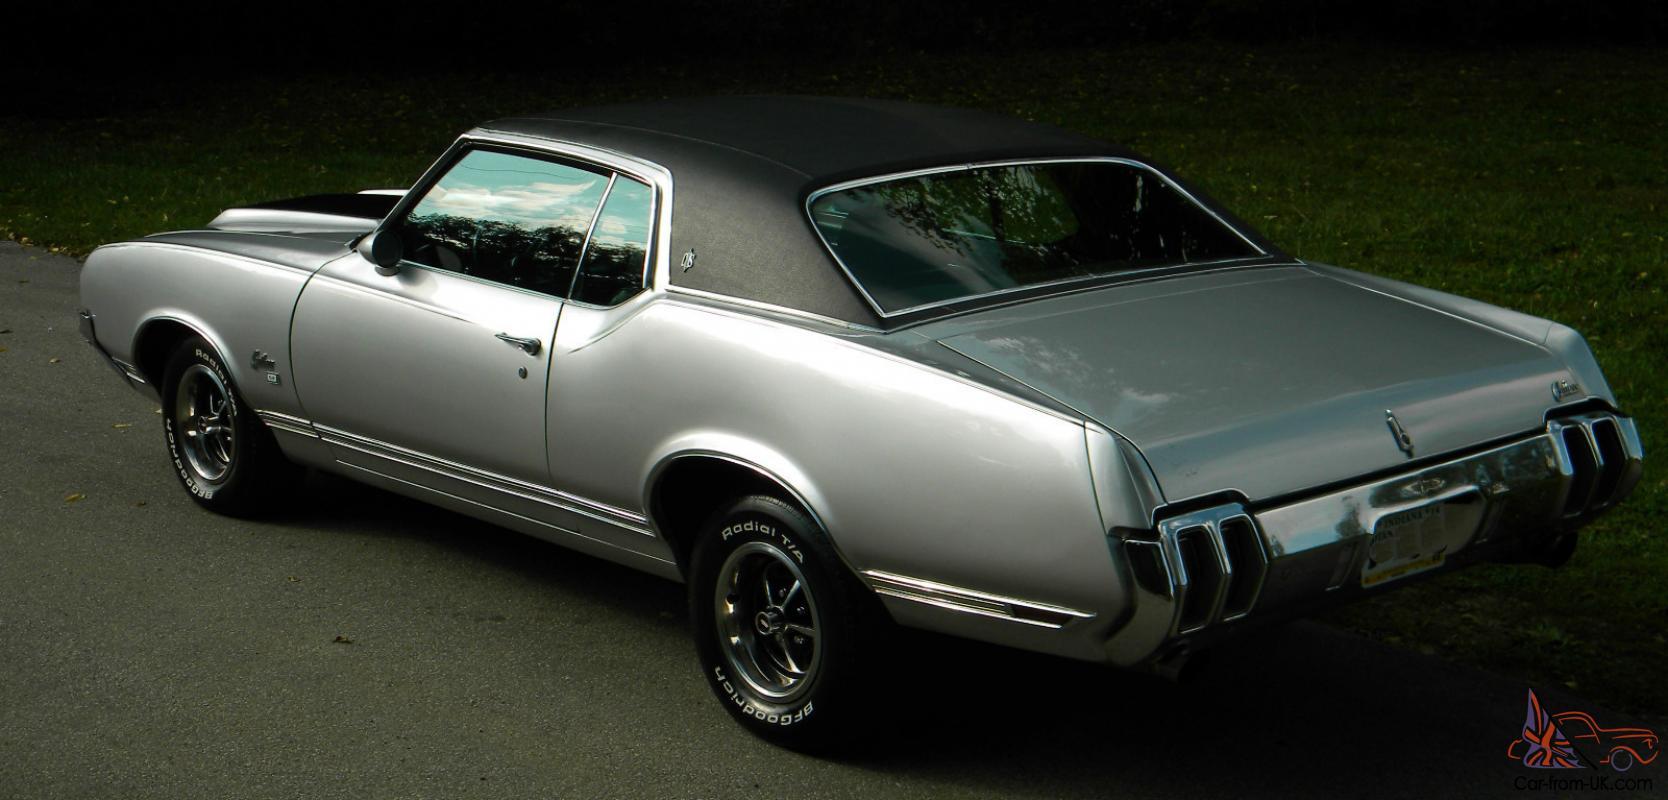 1970 Oldsmobile Cutlass SX Hardtop Coupe Silver with Black Landau Top /  Interior